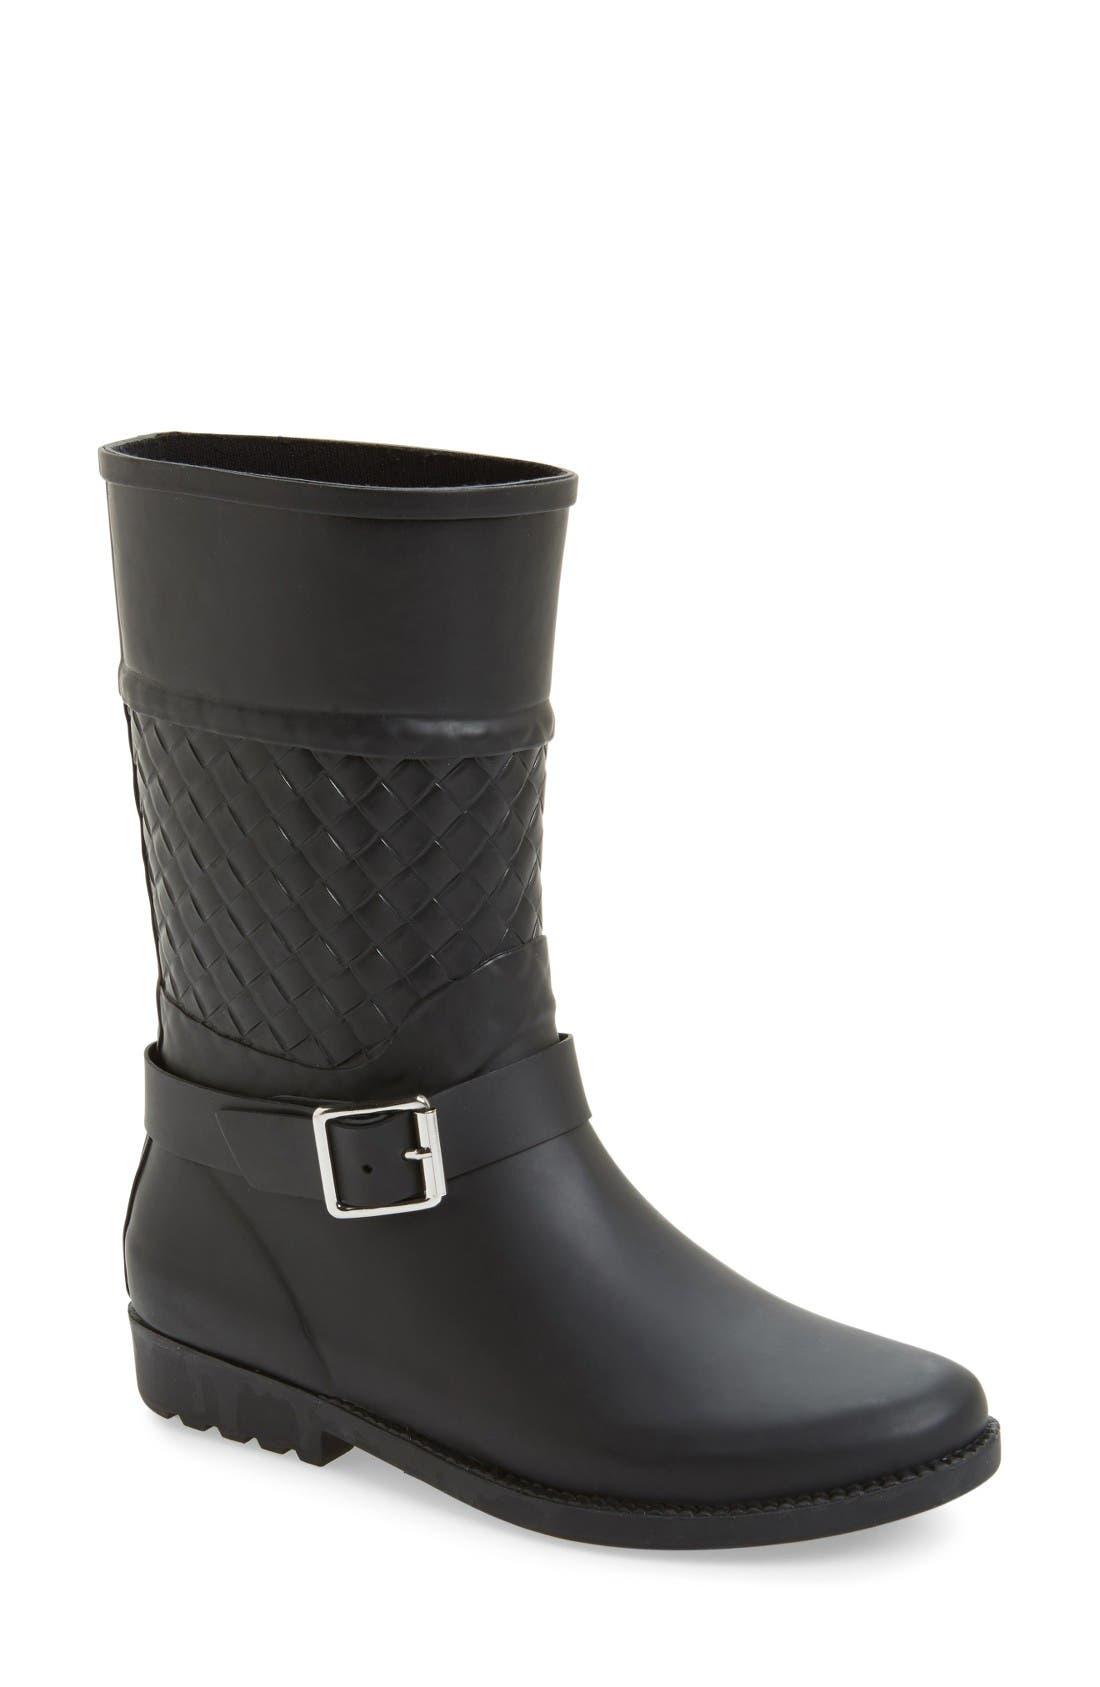 Alternate Image 1 Selected - däv Weston Waterproof Woven Shaft Rain Boot (Women)